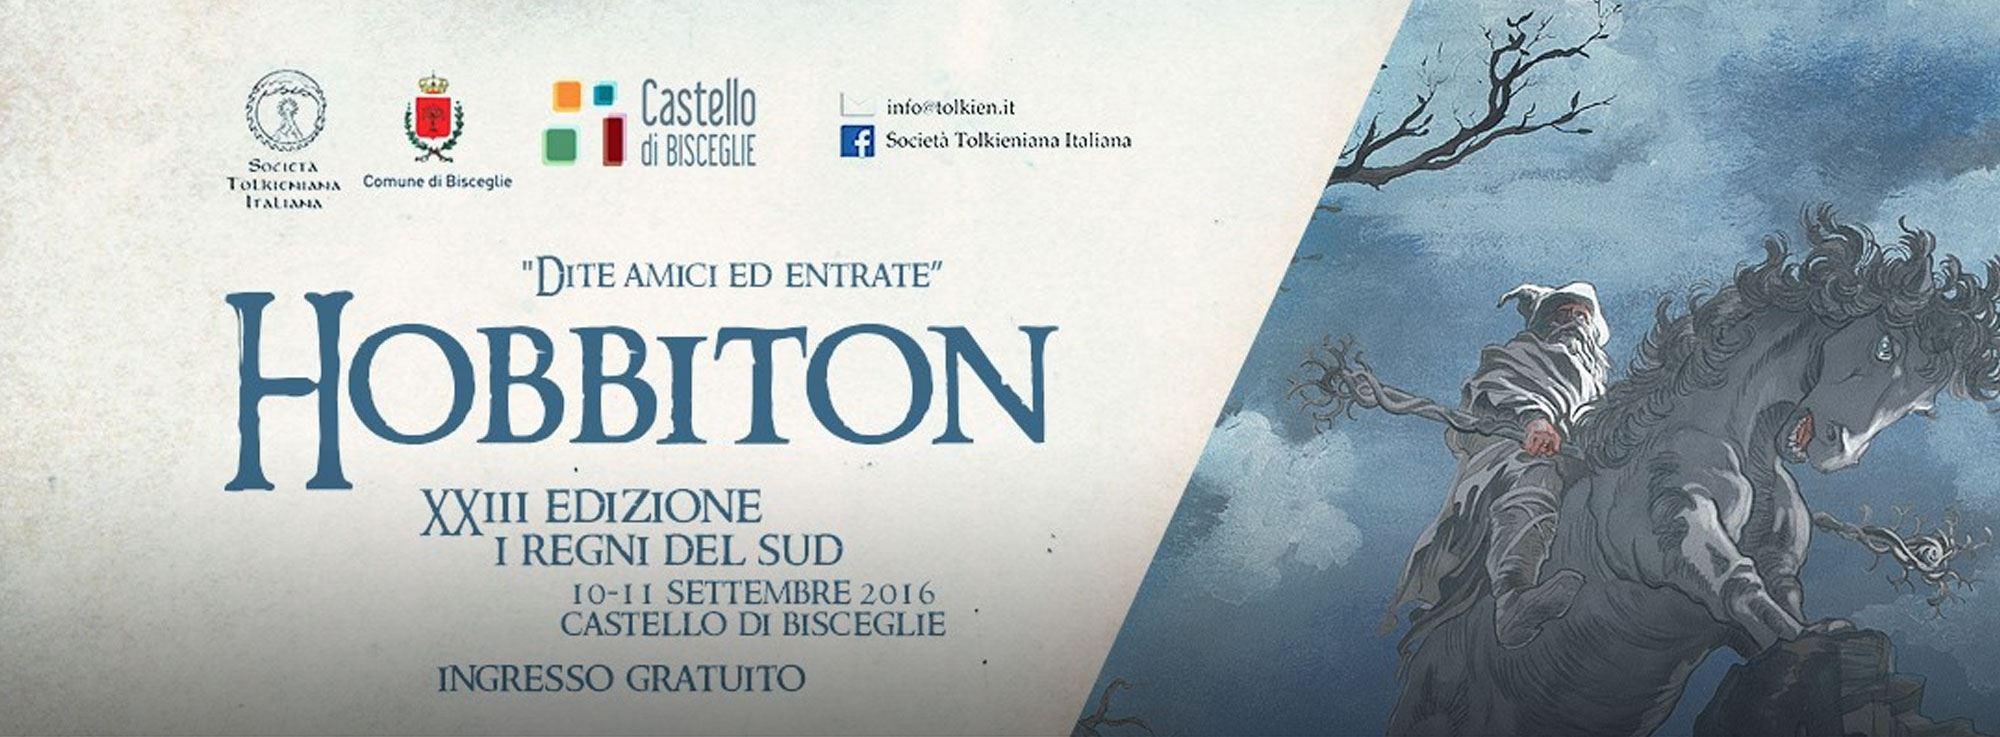 Bisceglie: Hobbiton, XXIII edizione - I Regni del Sud 2016